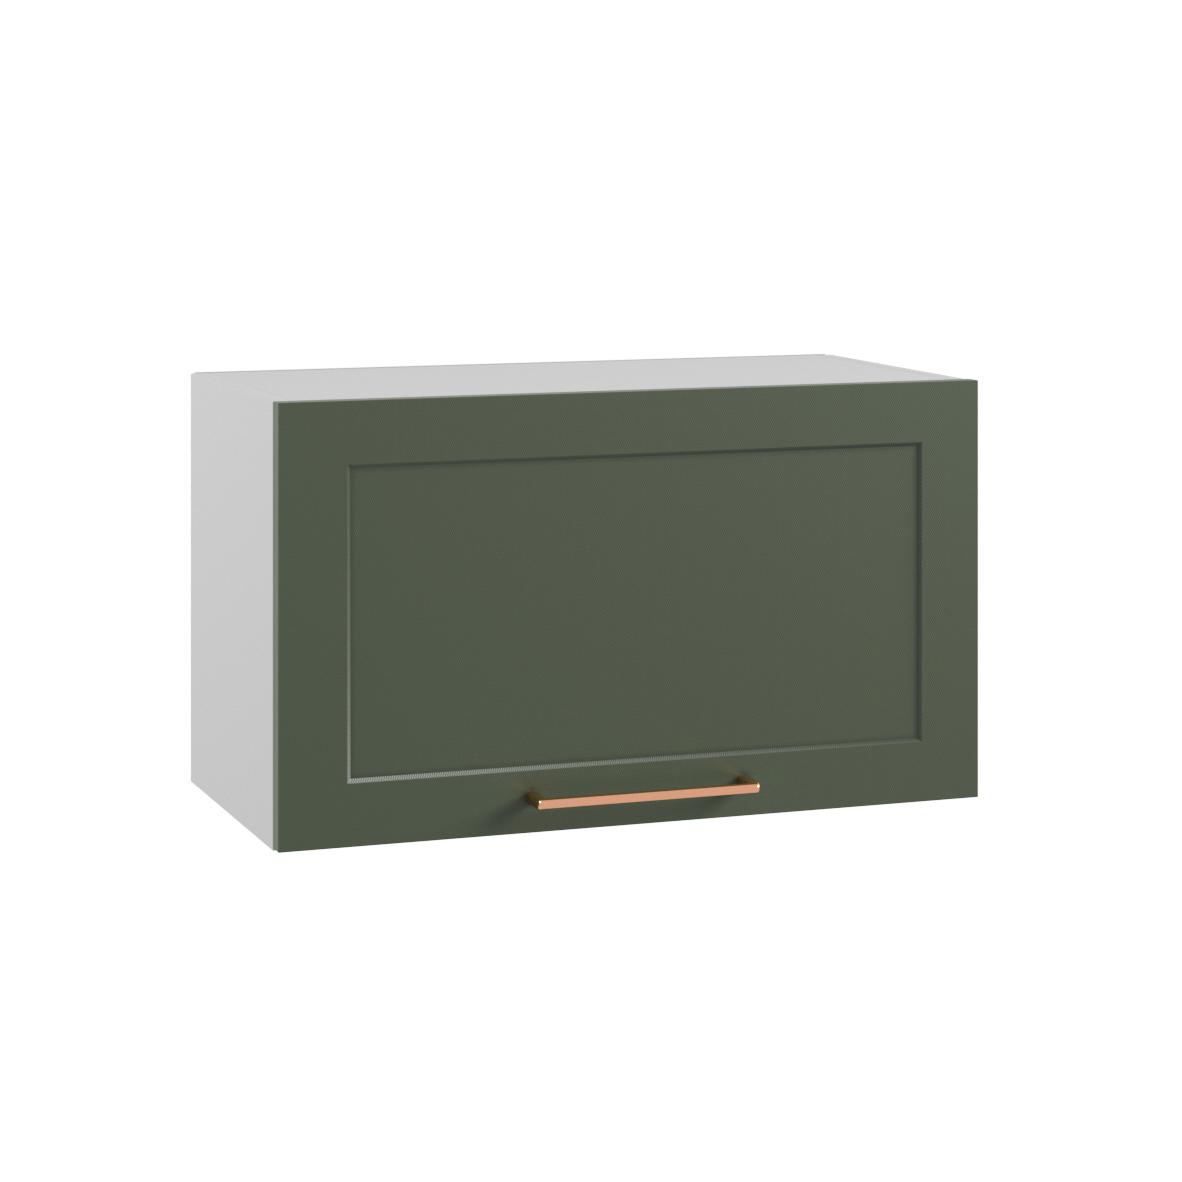 Кухня Квадро ГПГ 600 Шкаф верхний глубина 574